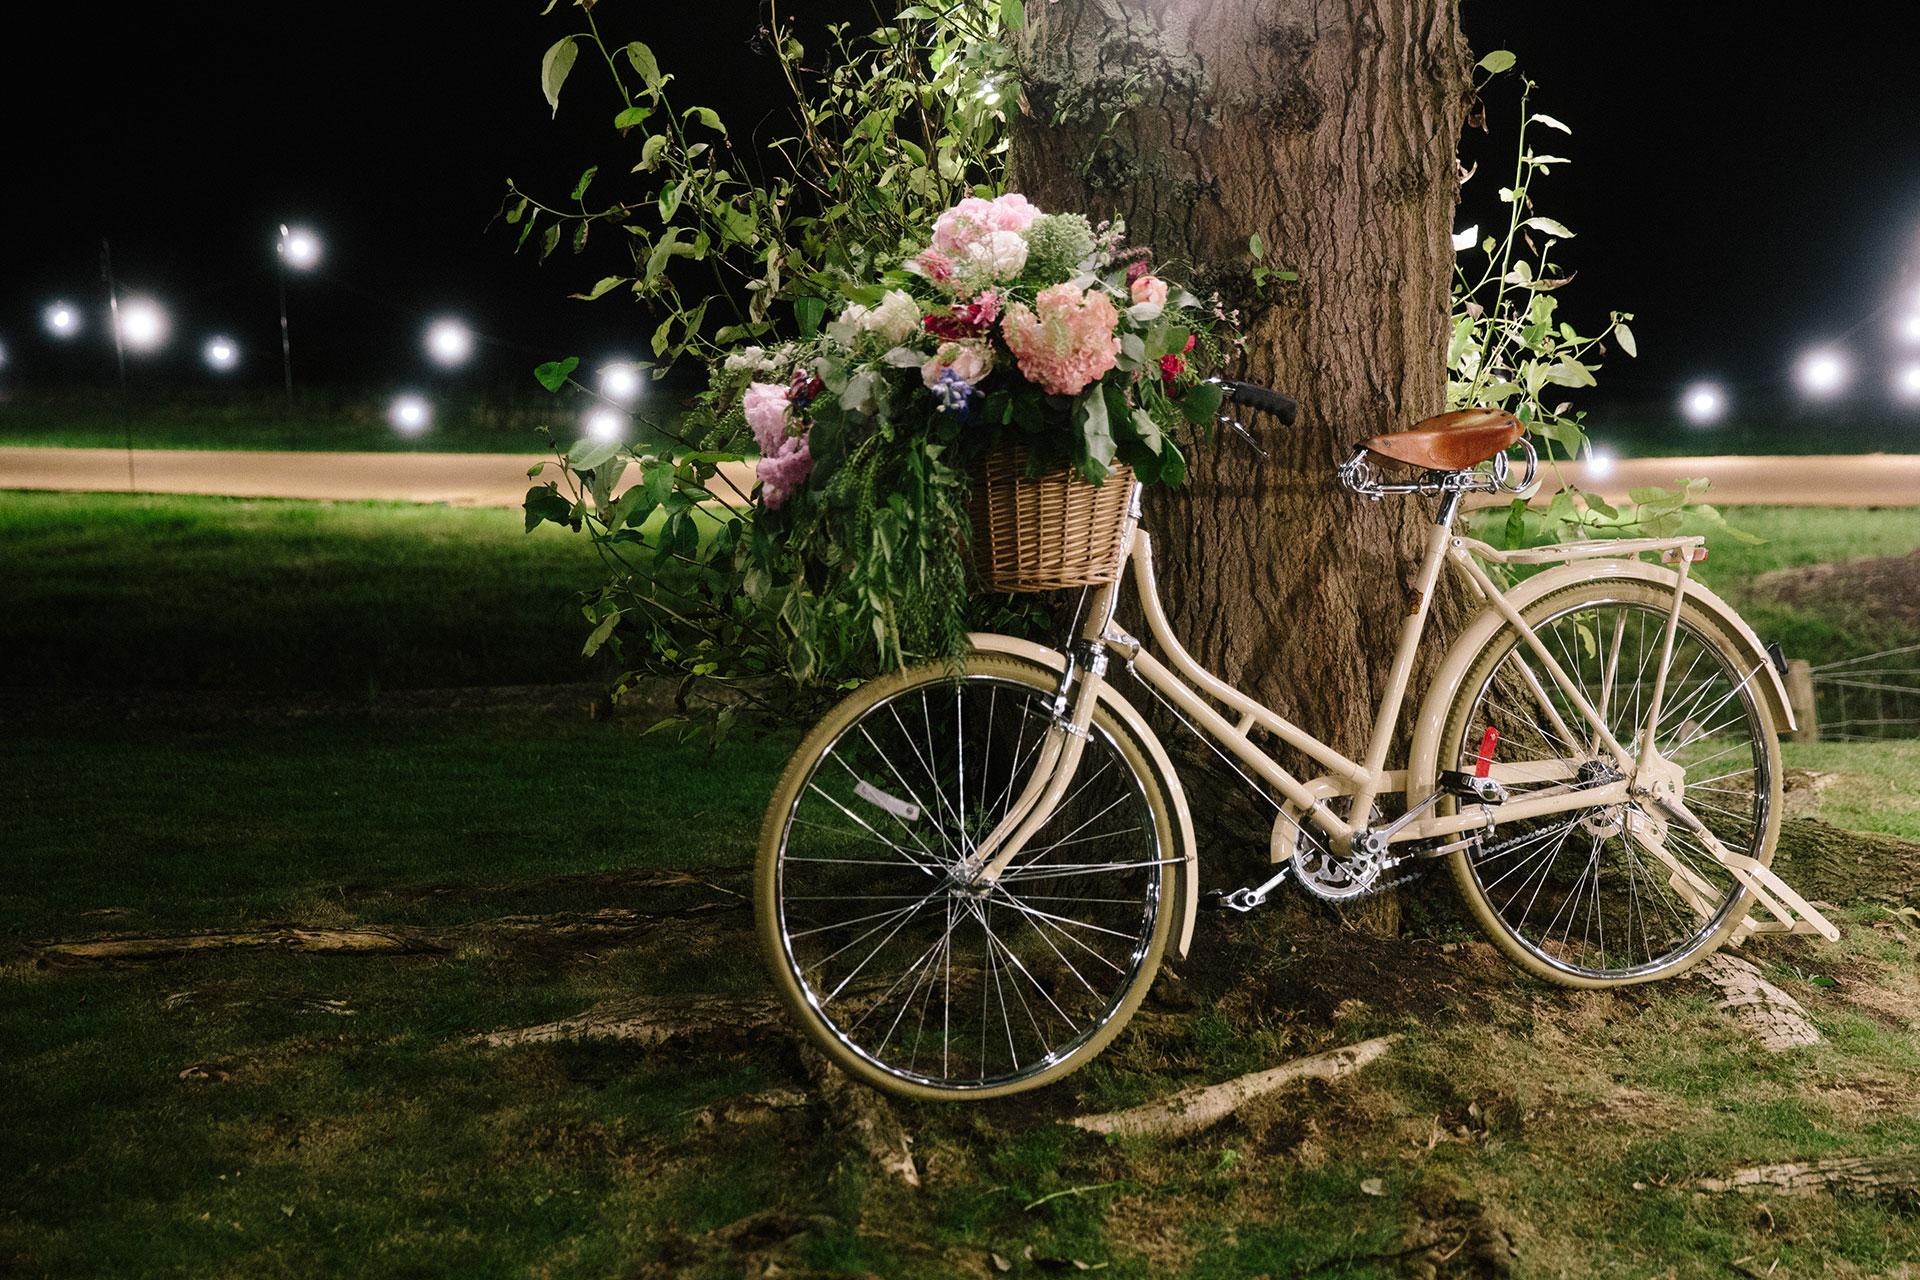 Langar-Hall-wedding-photographer-in-Nottinghamshire-Michael-Newington-Gray-113.jpg